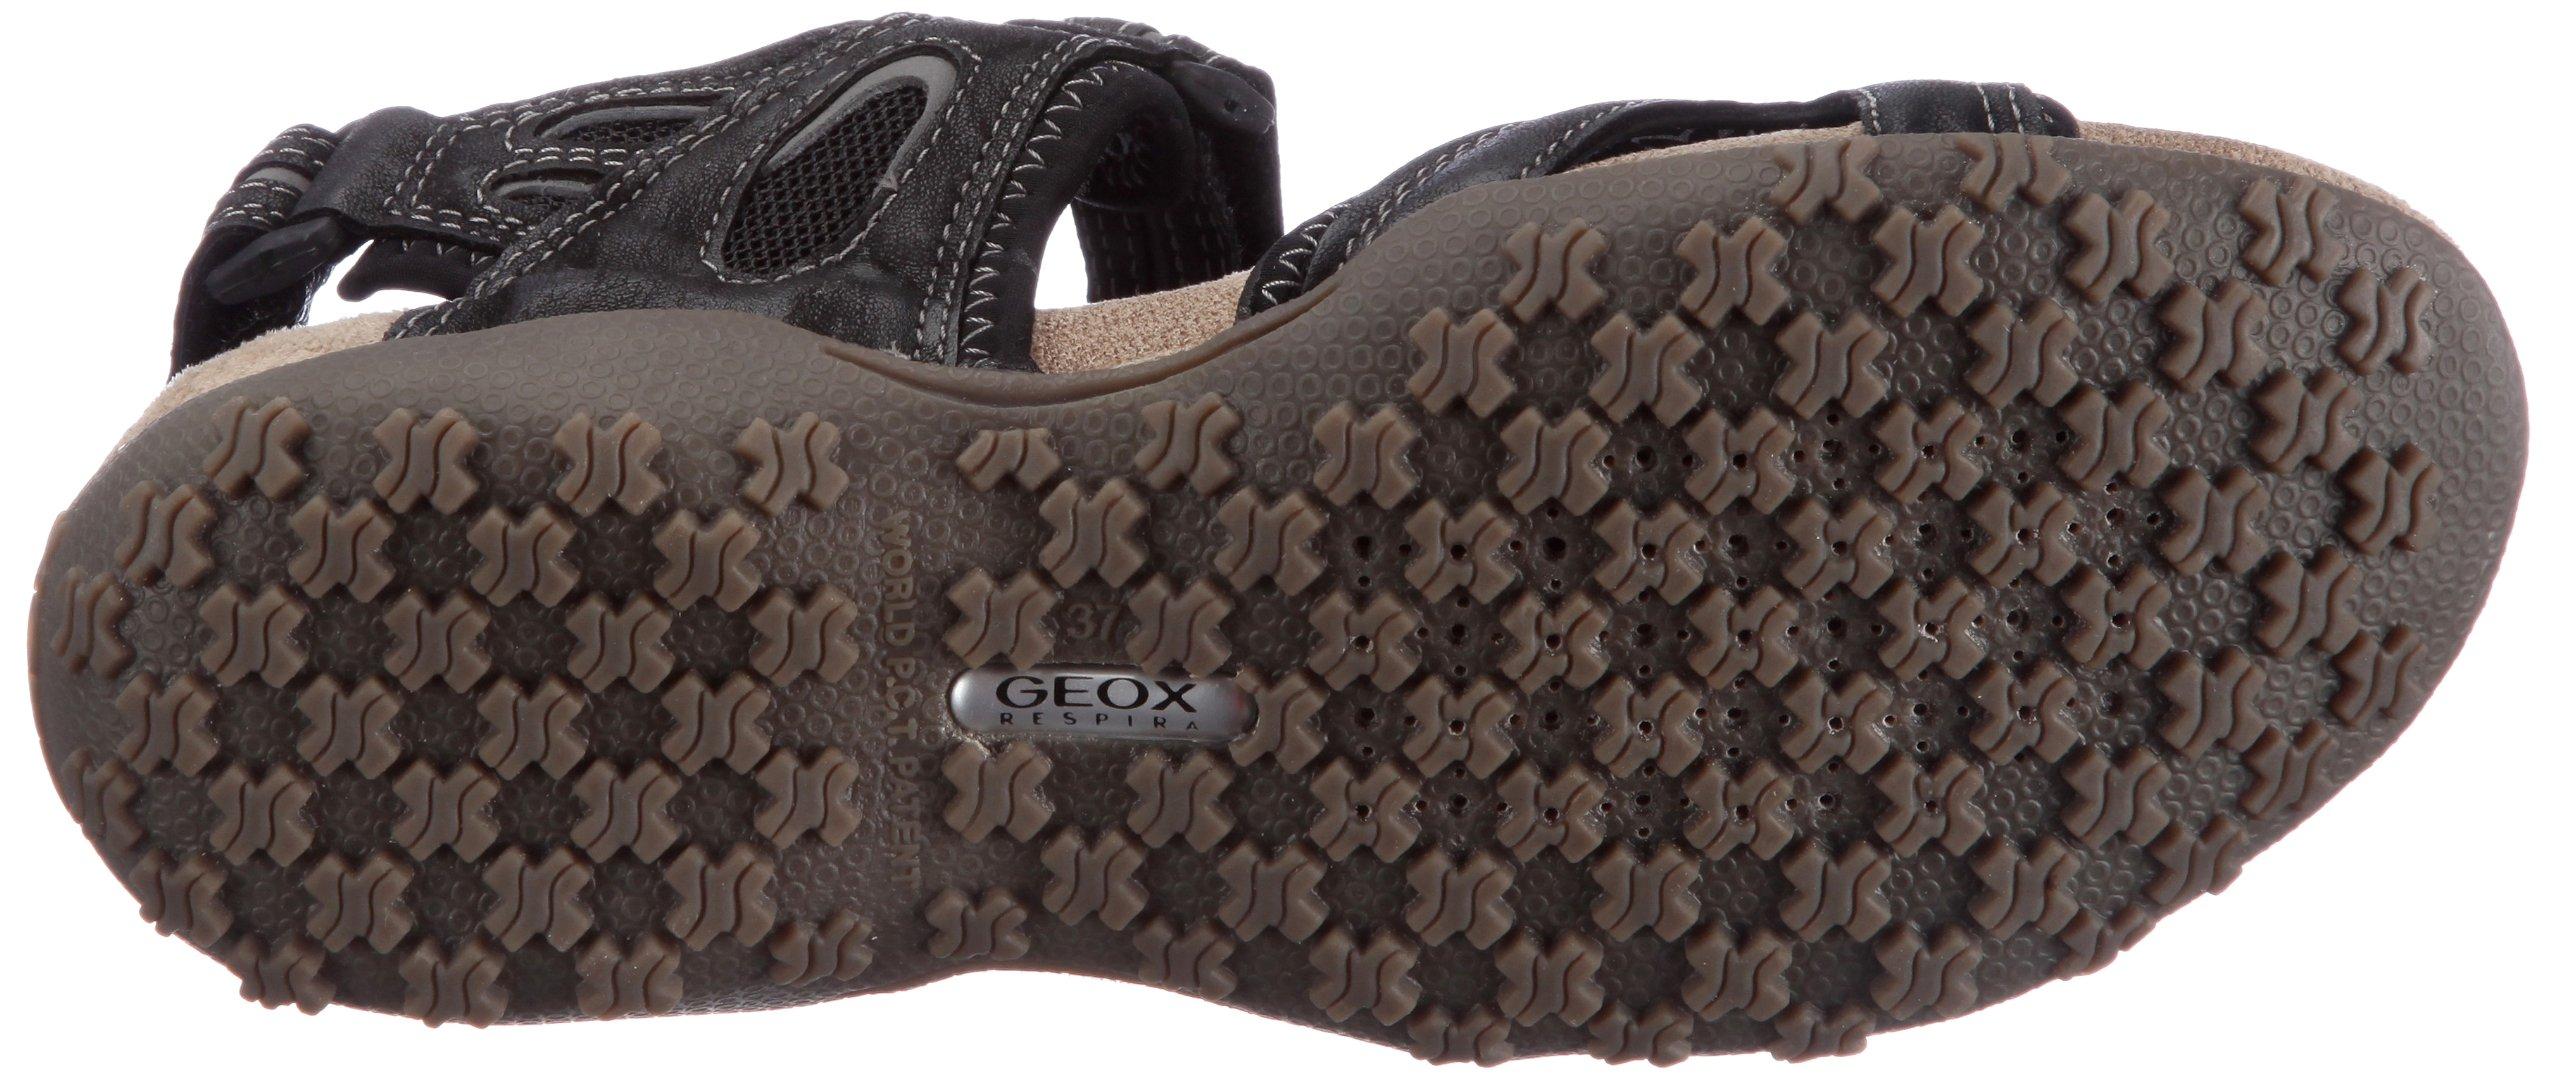 Geox Donna Strel D1125C05415C9999 Damen Sandalen/Fashion-Sandalen 3